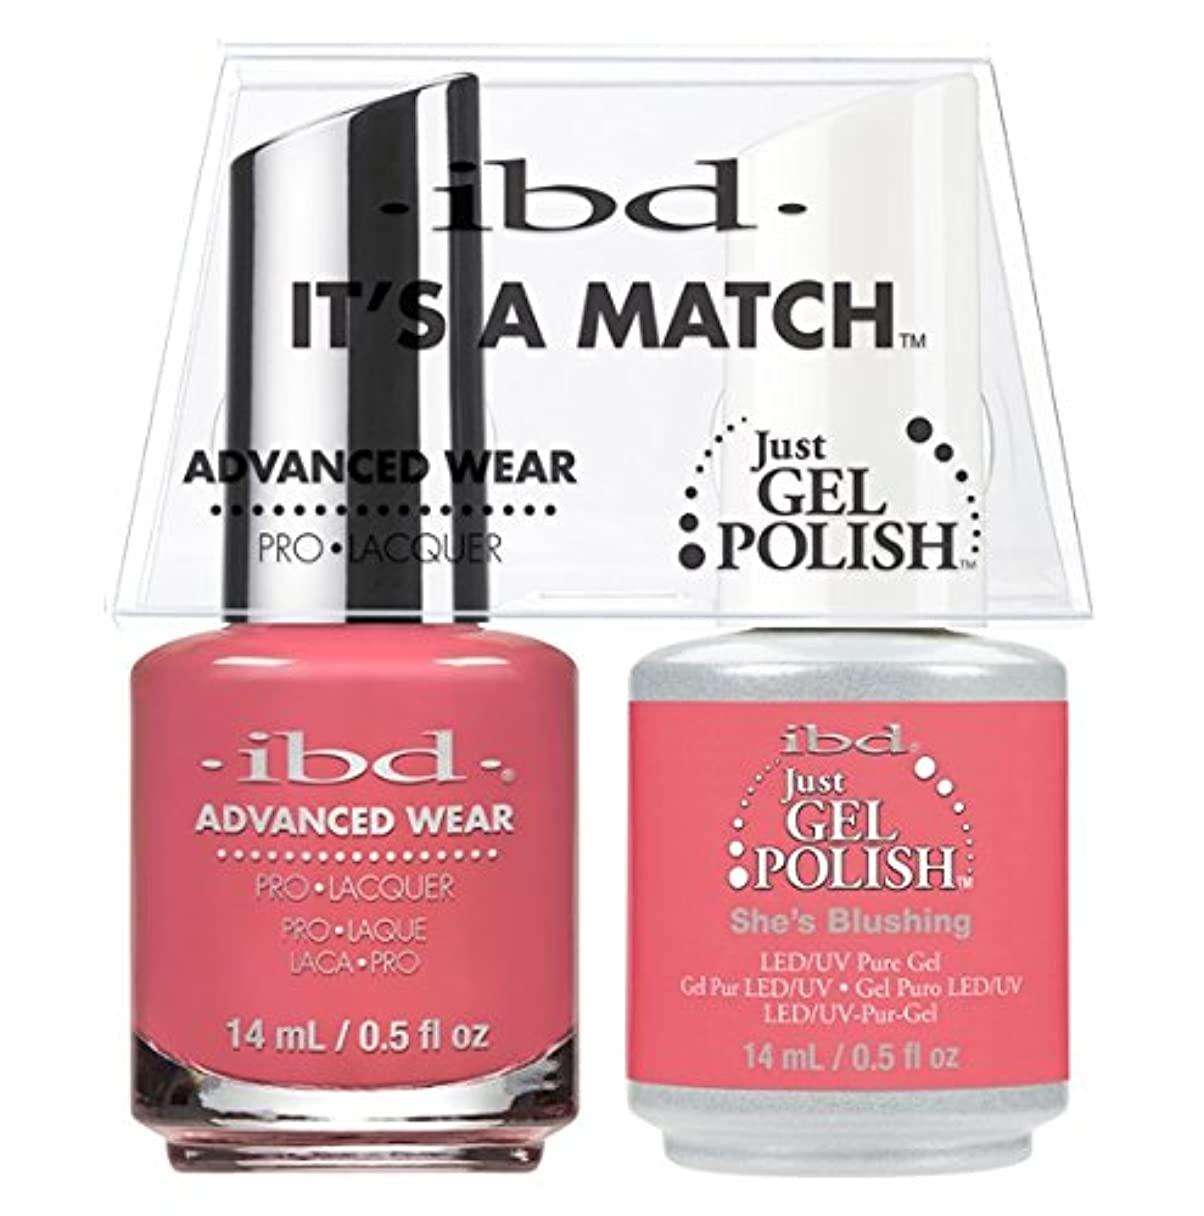 ibd - It's A Match -Duo Pack- She's Blushing - 14 mL / 0.5 oz Each